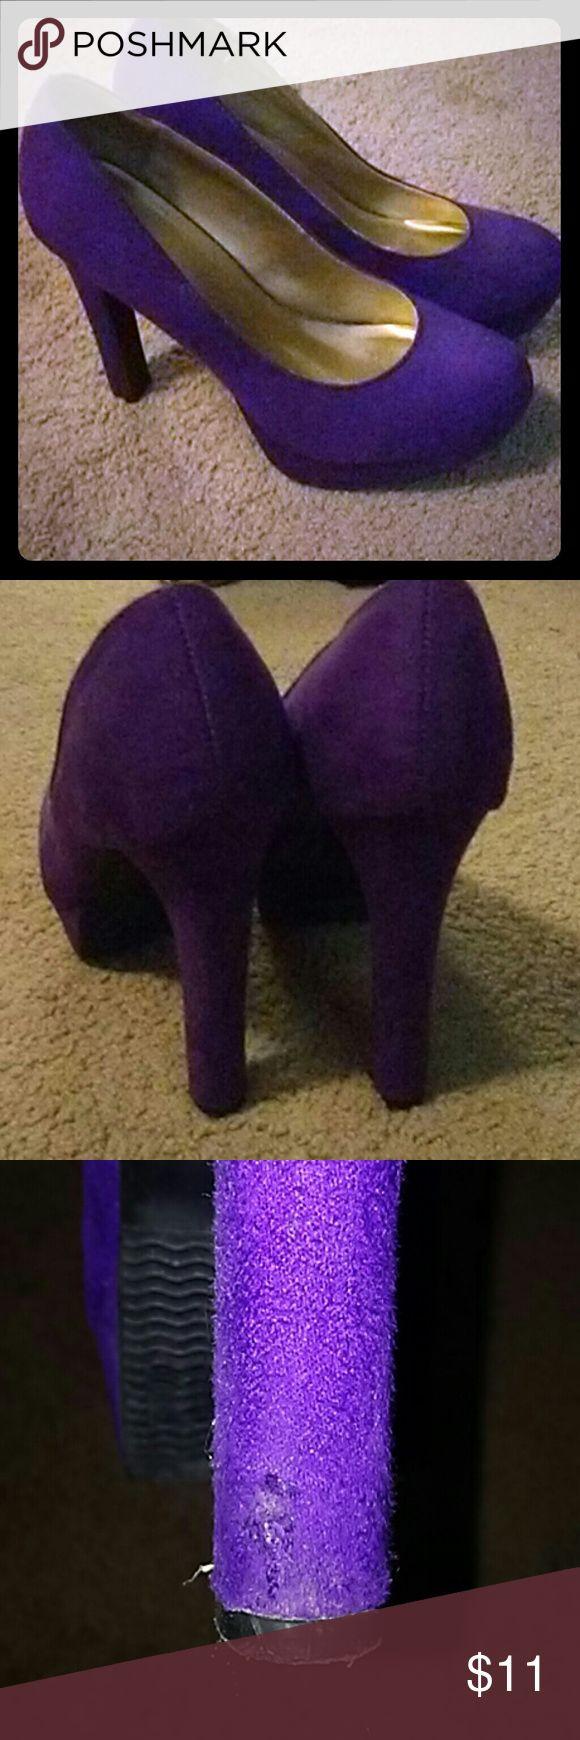 17 Best ideas about Purple High Heels on Pinterest | Sexy heels ...